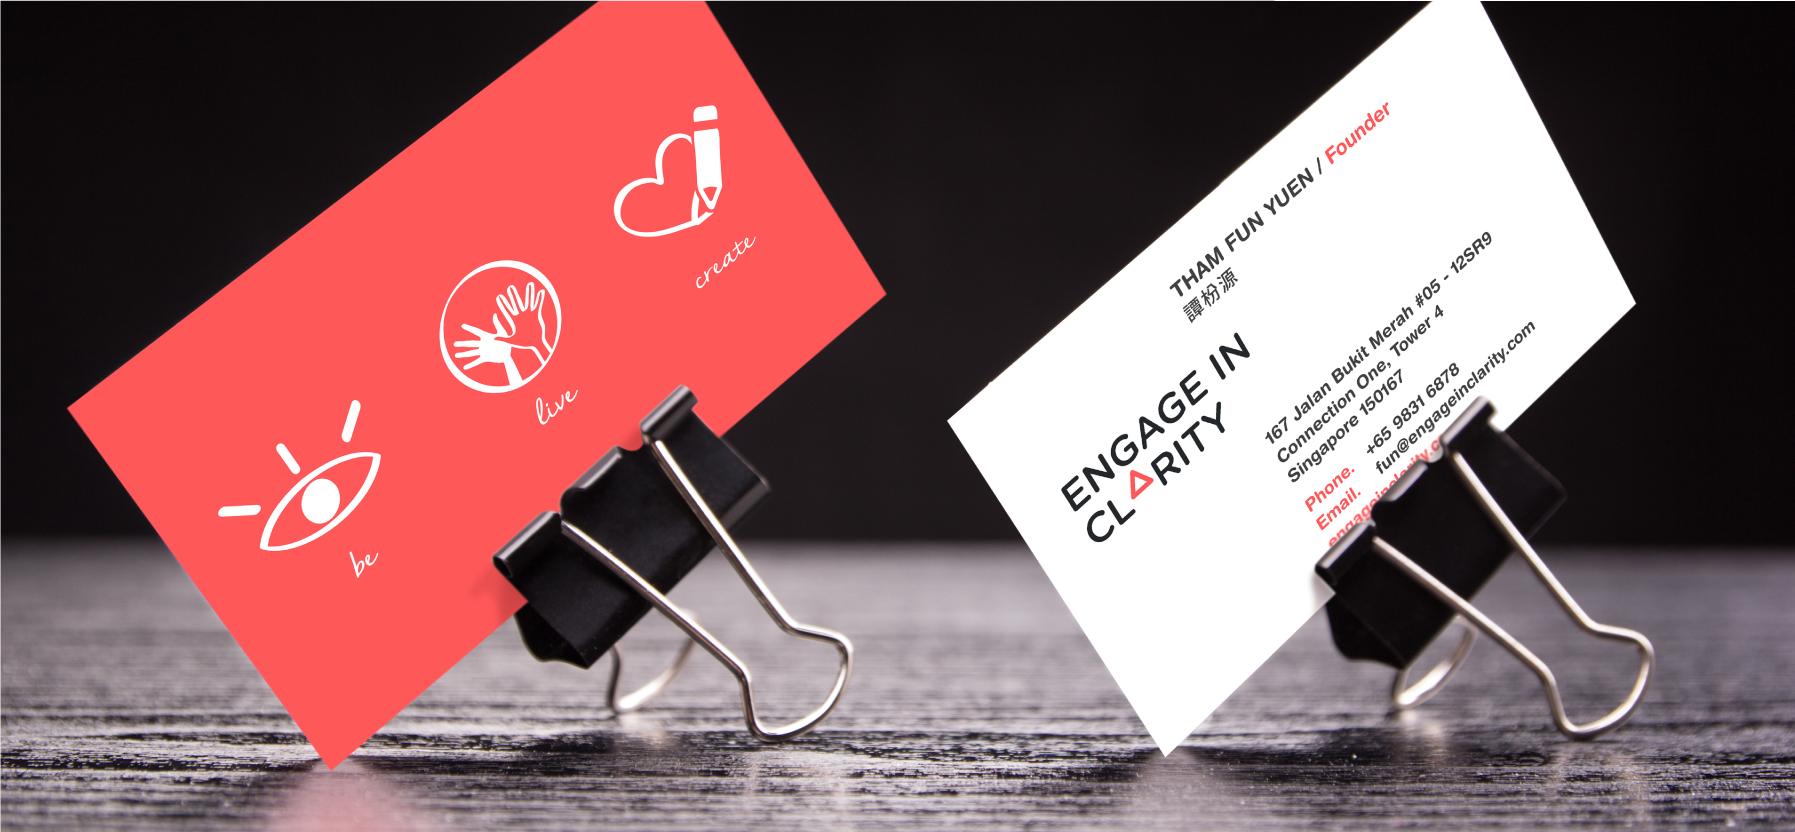 Brand Identity, Logo Design, Stationery Design for Consciousness Mindfulness Training company